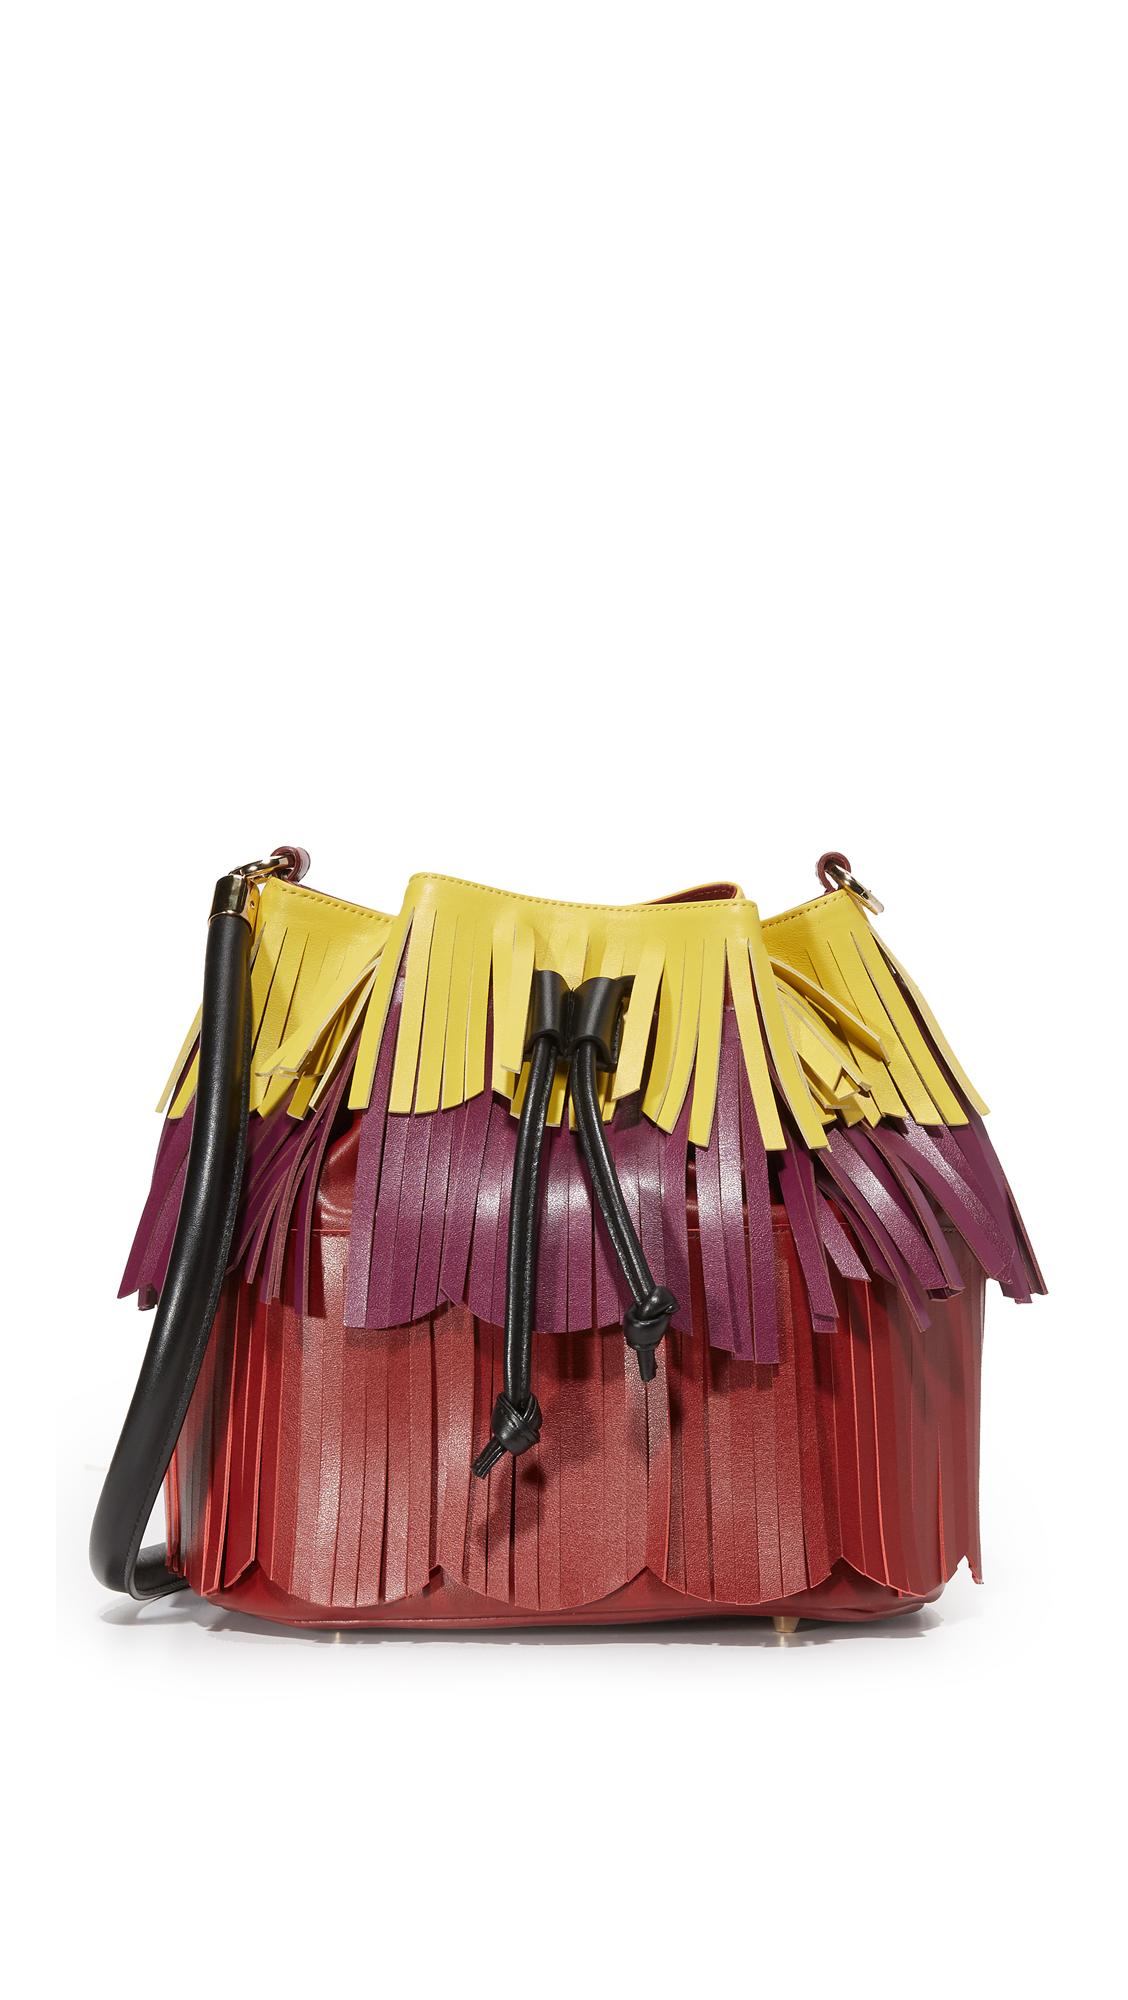 sara battaglia female sara battaglia jasmine bucket bag yellowvioletred